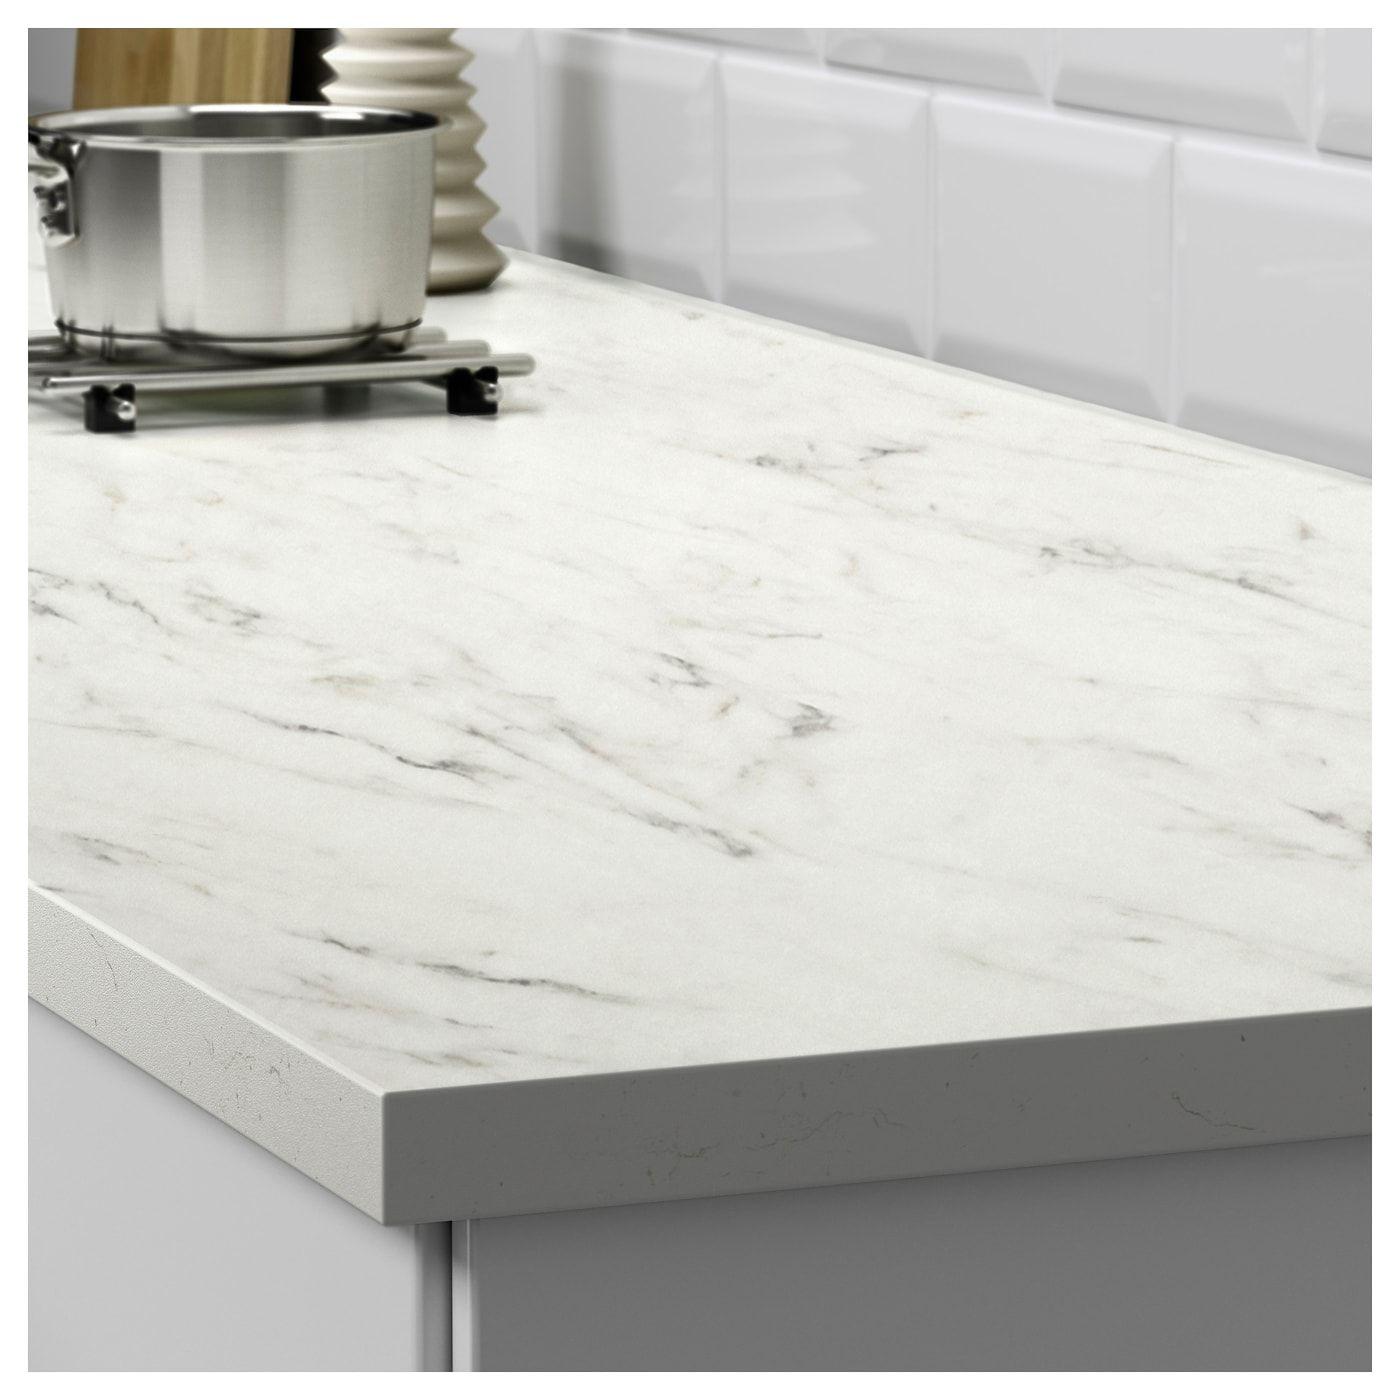 Ekbacken Arbeitsplatte Weiss Marmoriert Laminat Ikea Deutschland Replacing Kitchen Countertops Countertops Kitchen Countertop Materials